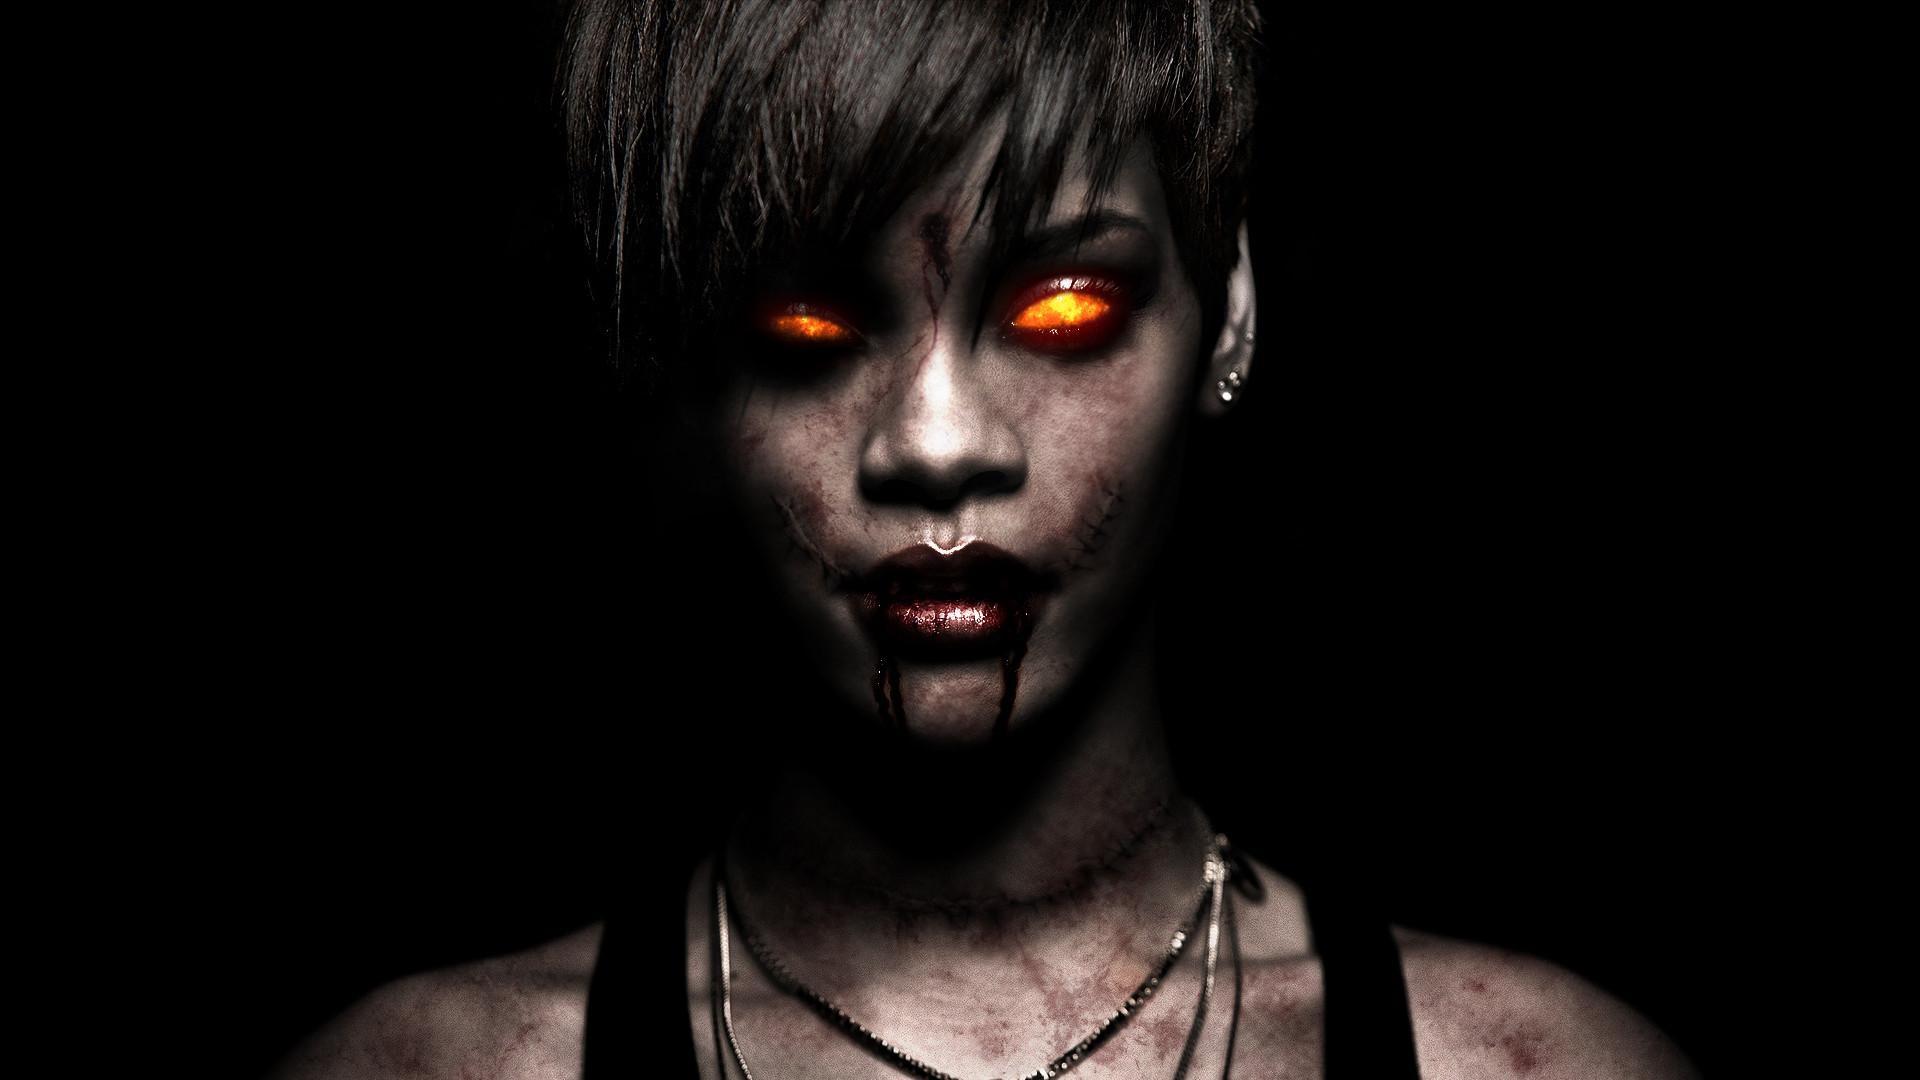 Res: 1920x1080, Rihanna Brunette Zombie Demon Creepy face eyes singer musician women